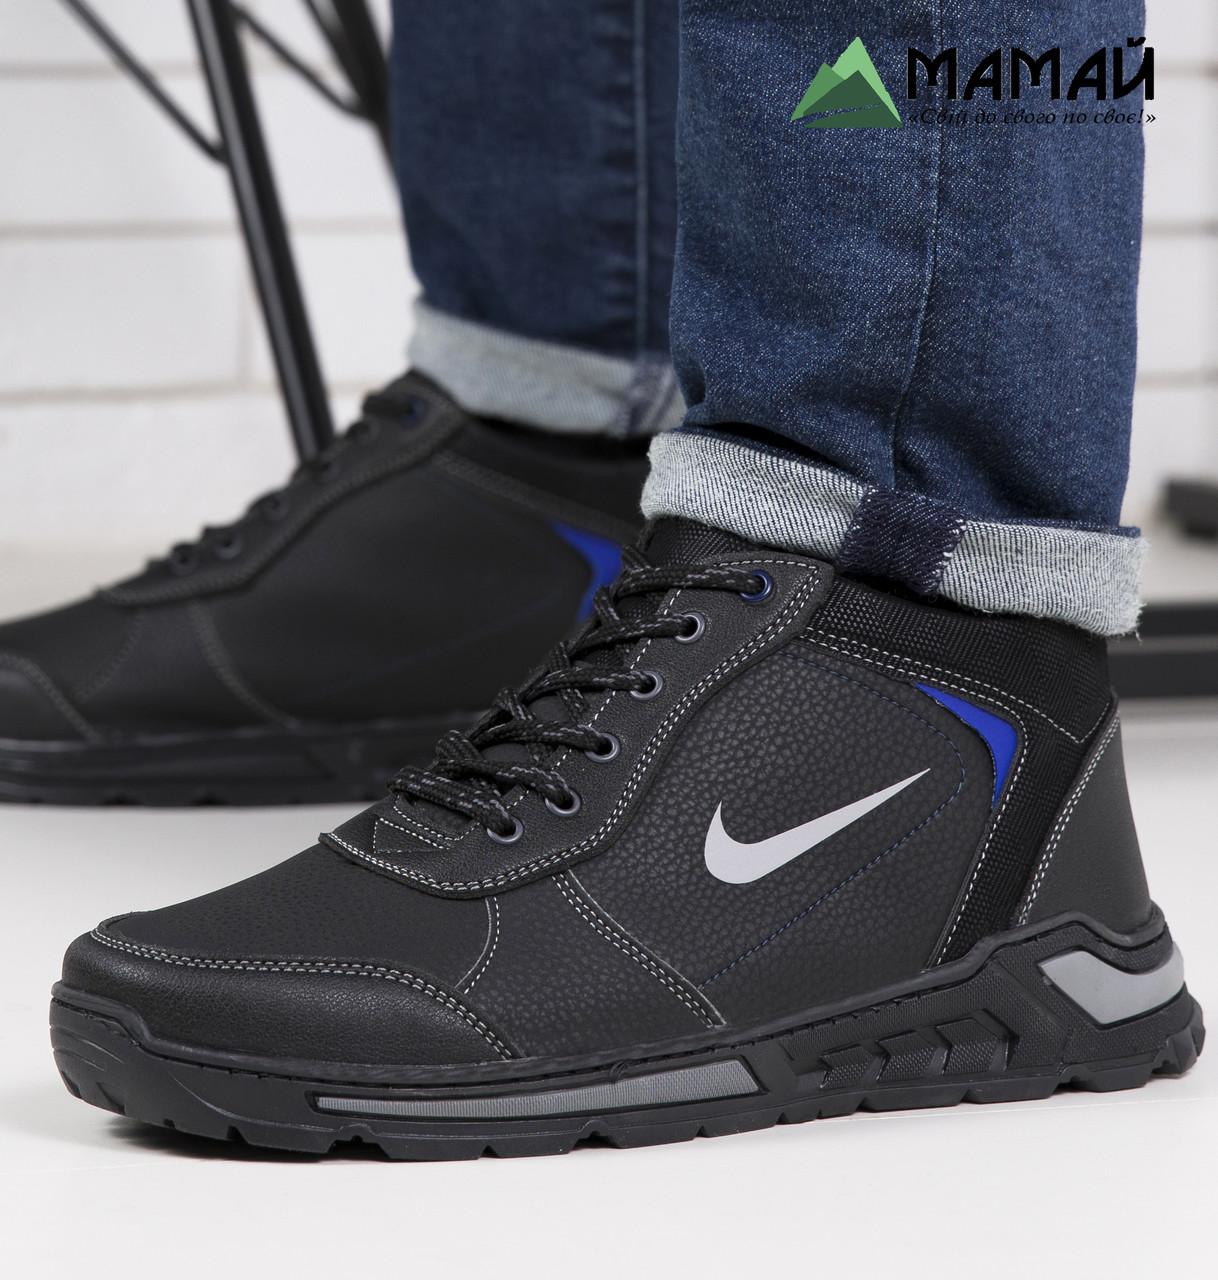 Ботинки мужские зимние 43р